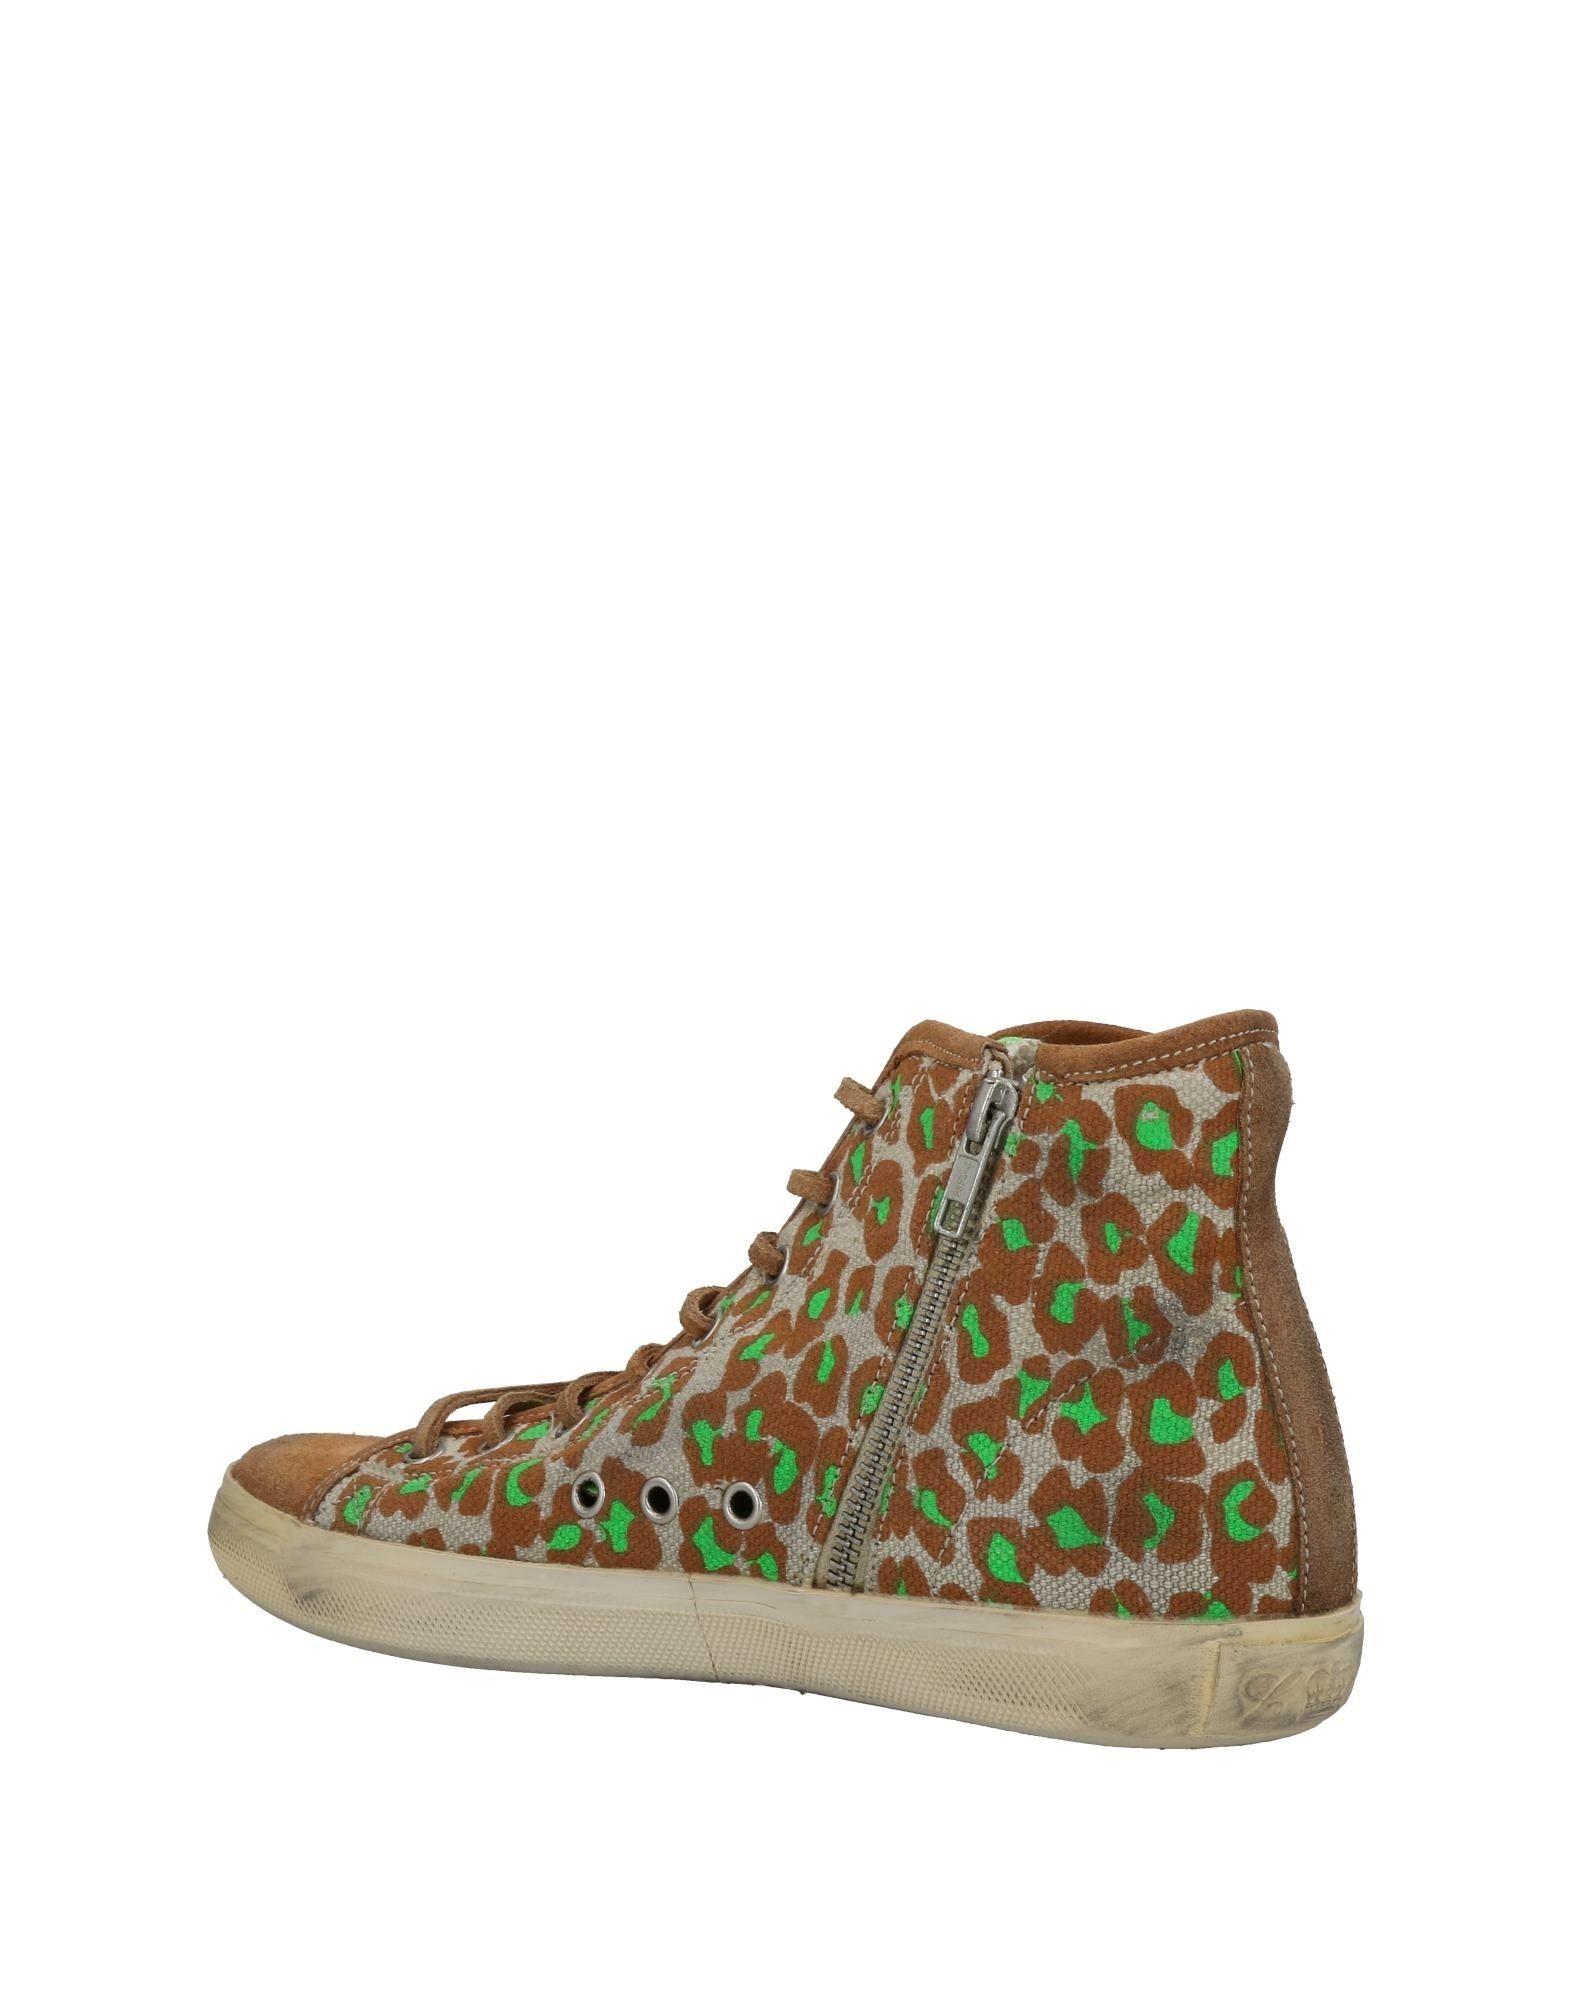 Leather 11460244HU Crown Sneakers Damen  11460244HU Leather Gute Qualität beliebte Schuhe 8e5c20